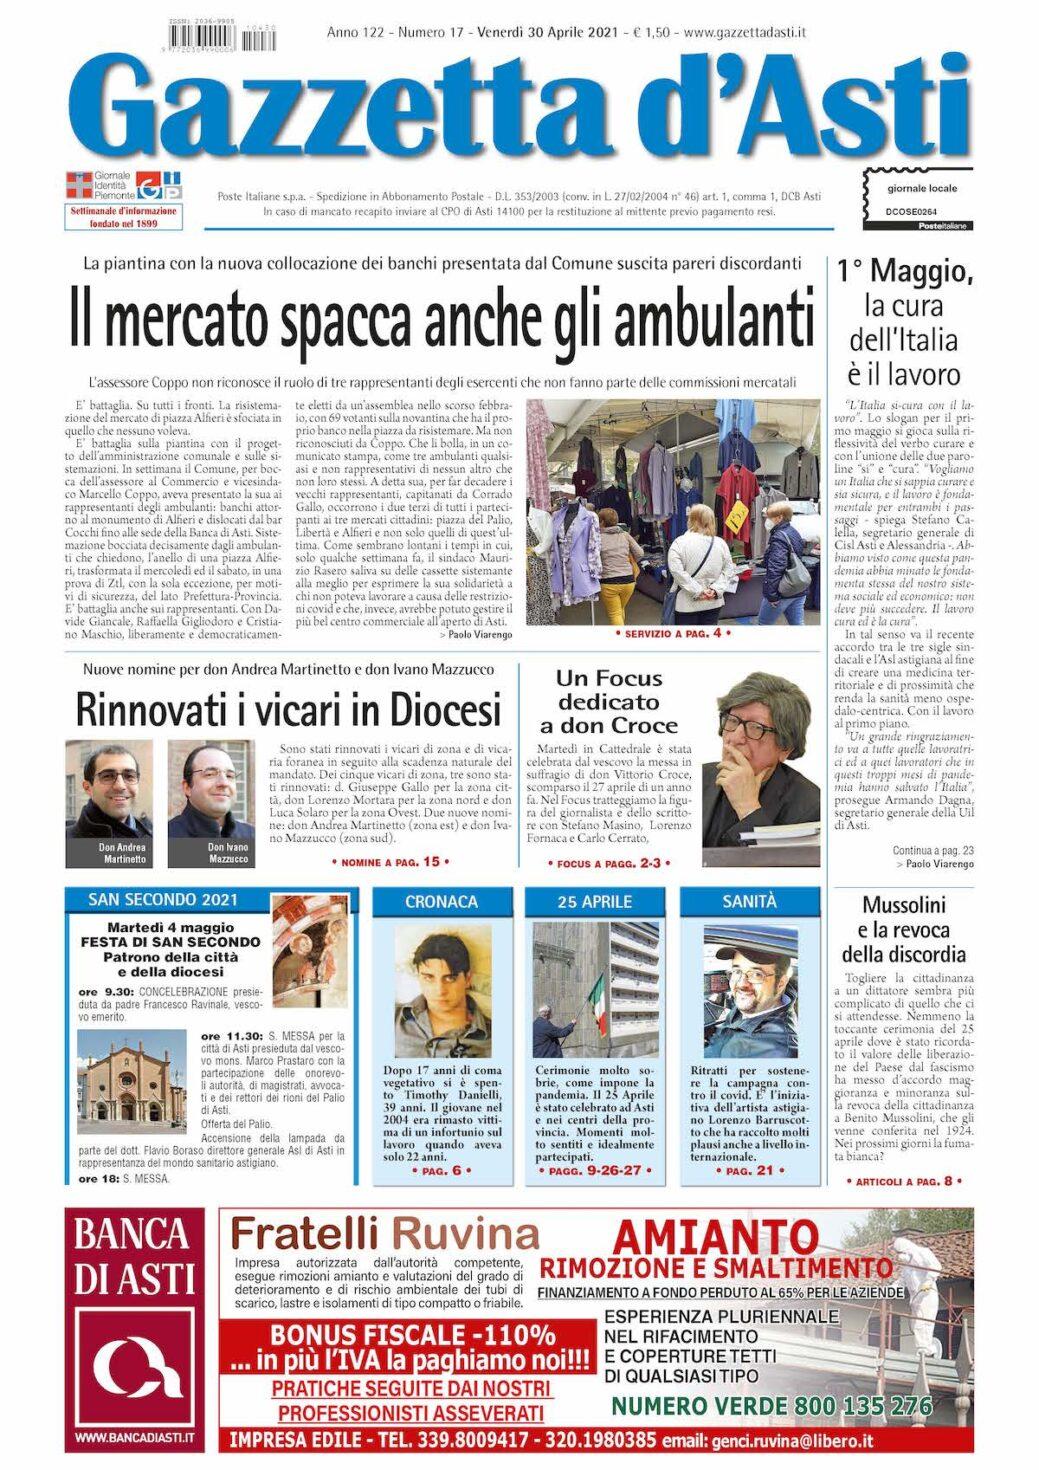 Prima pagina – 30 aprile 2021